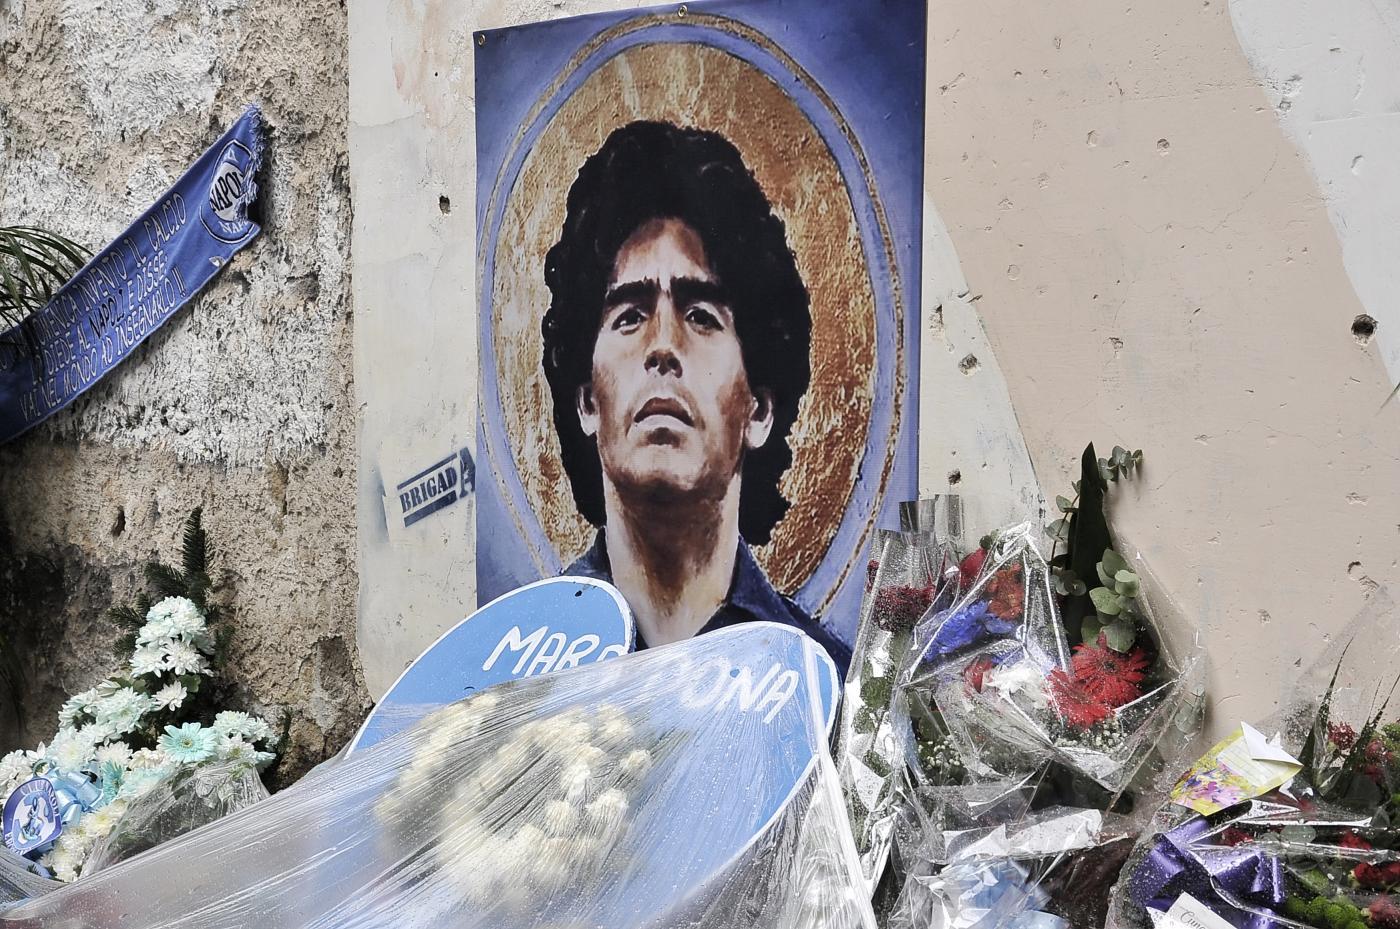 I quartieri Spagnoli di Napoli celebrano Maradona